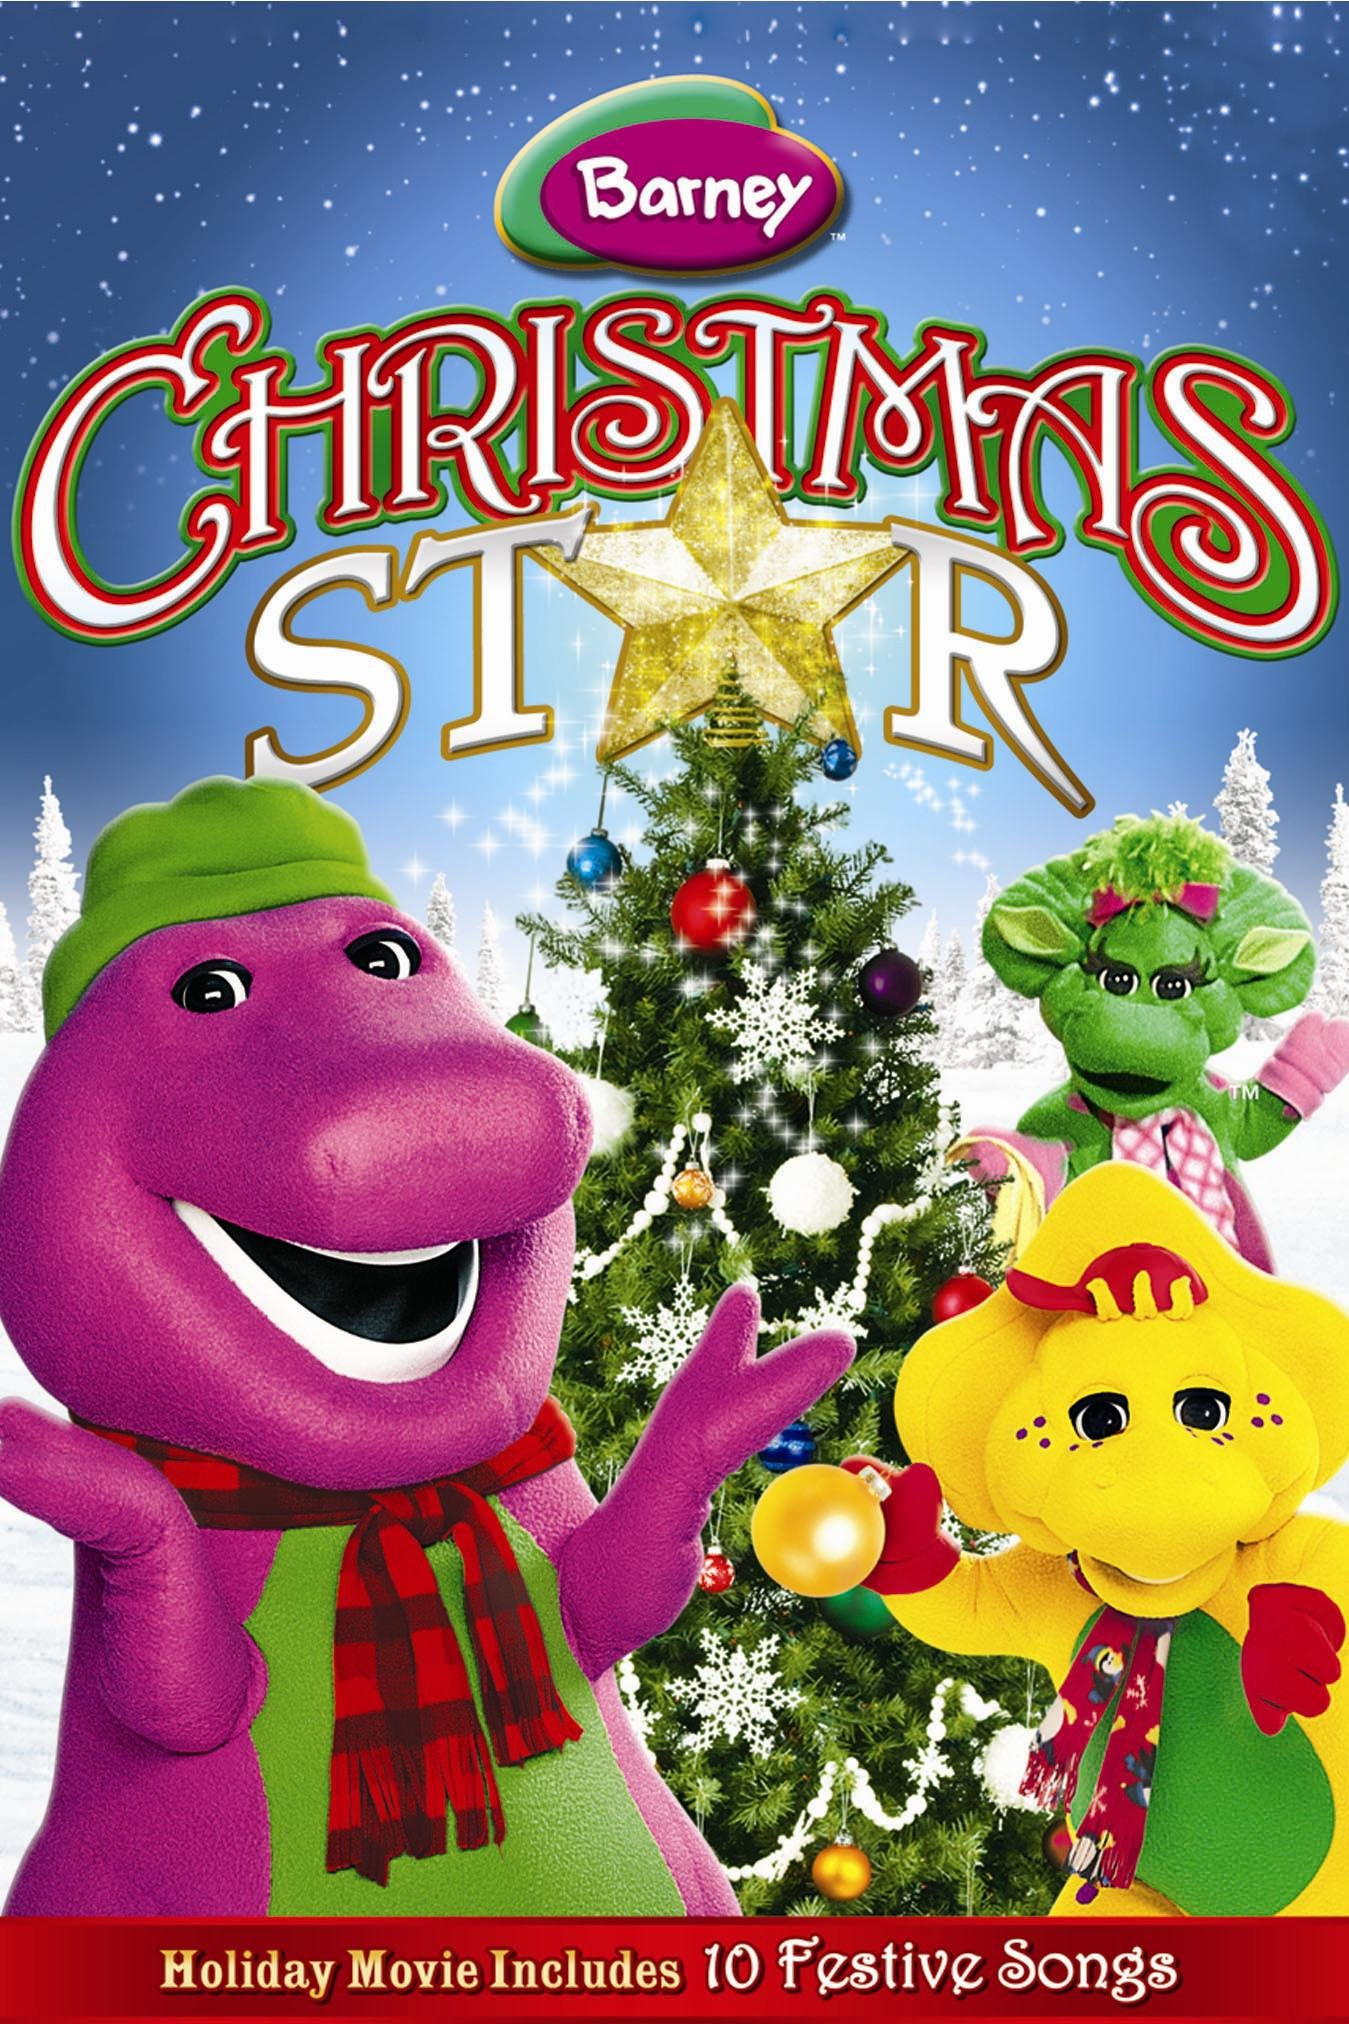 Amazon.com: Barney: Christmas Star: Allyn Carrell, Tim Dever, Bill ...